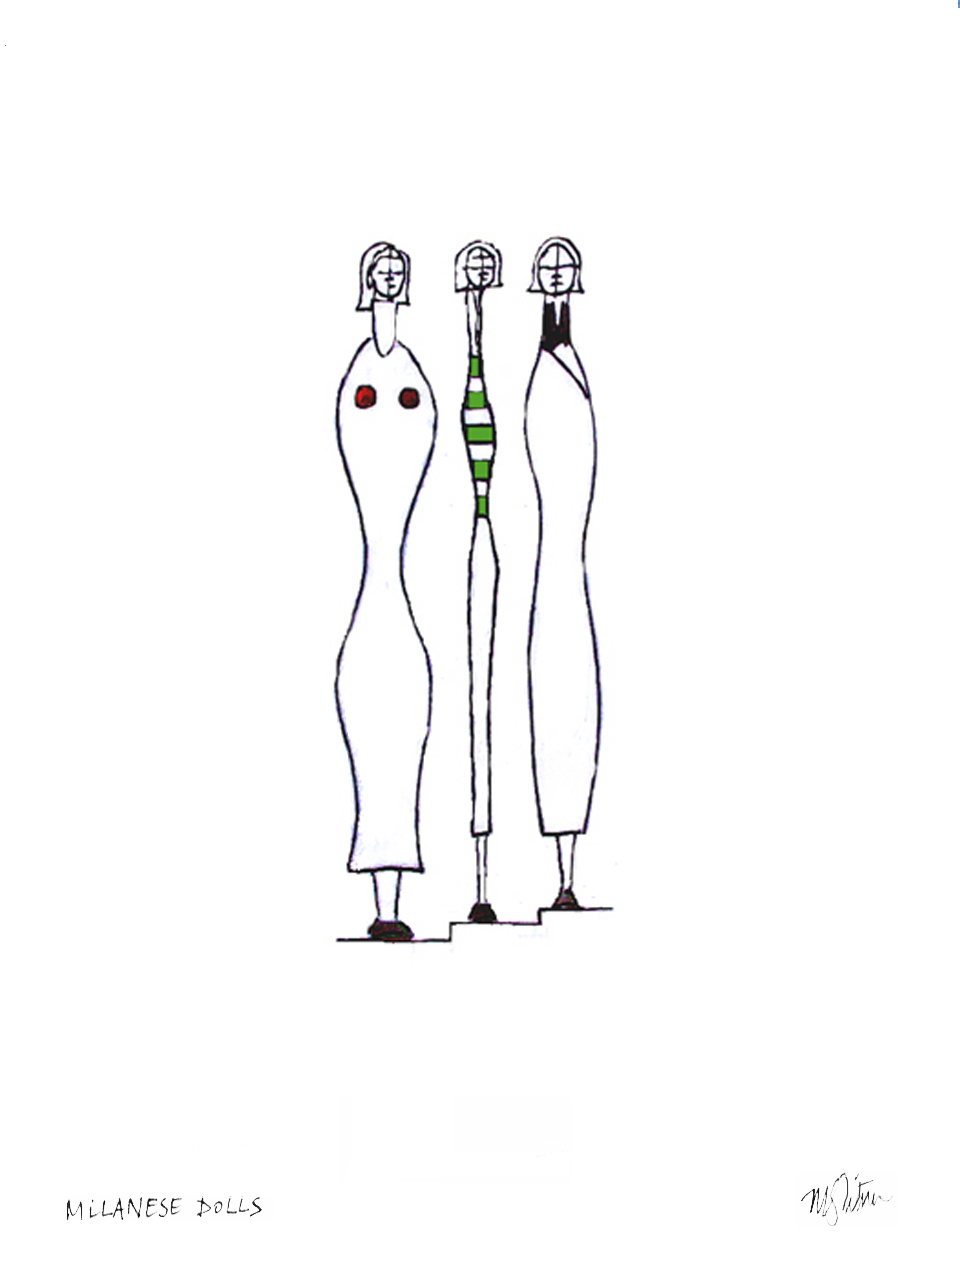 Milanese Dolls